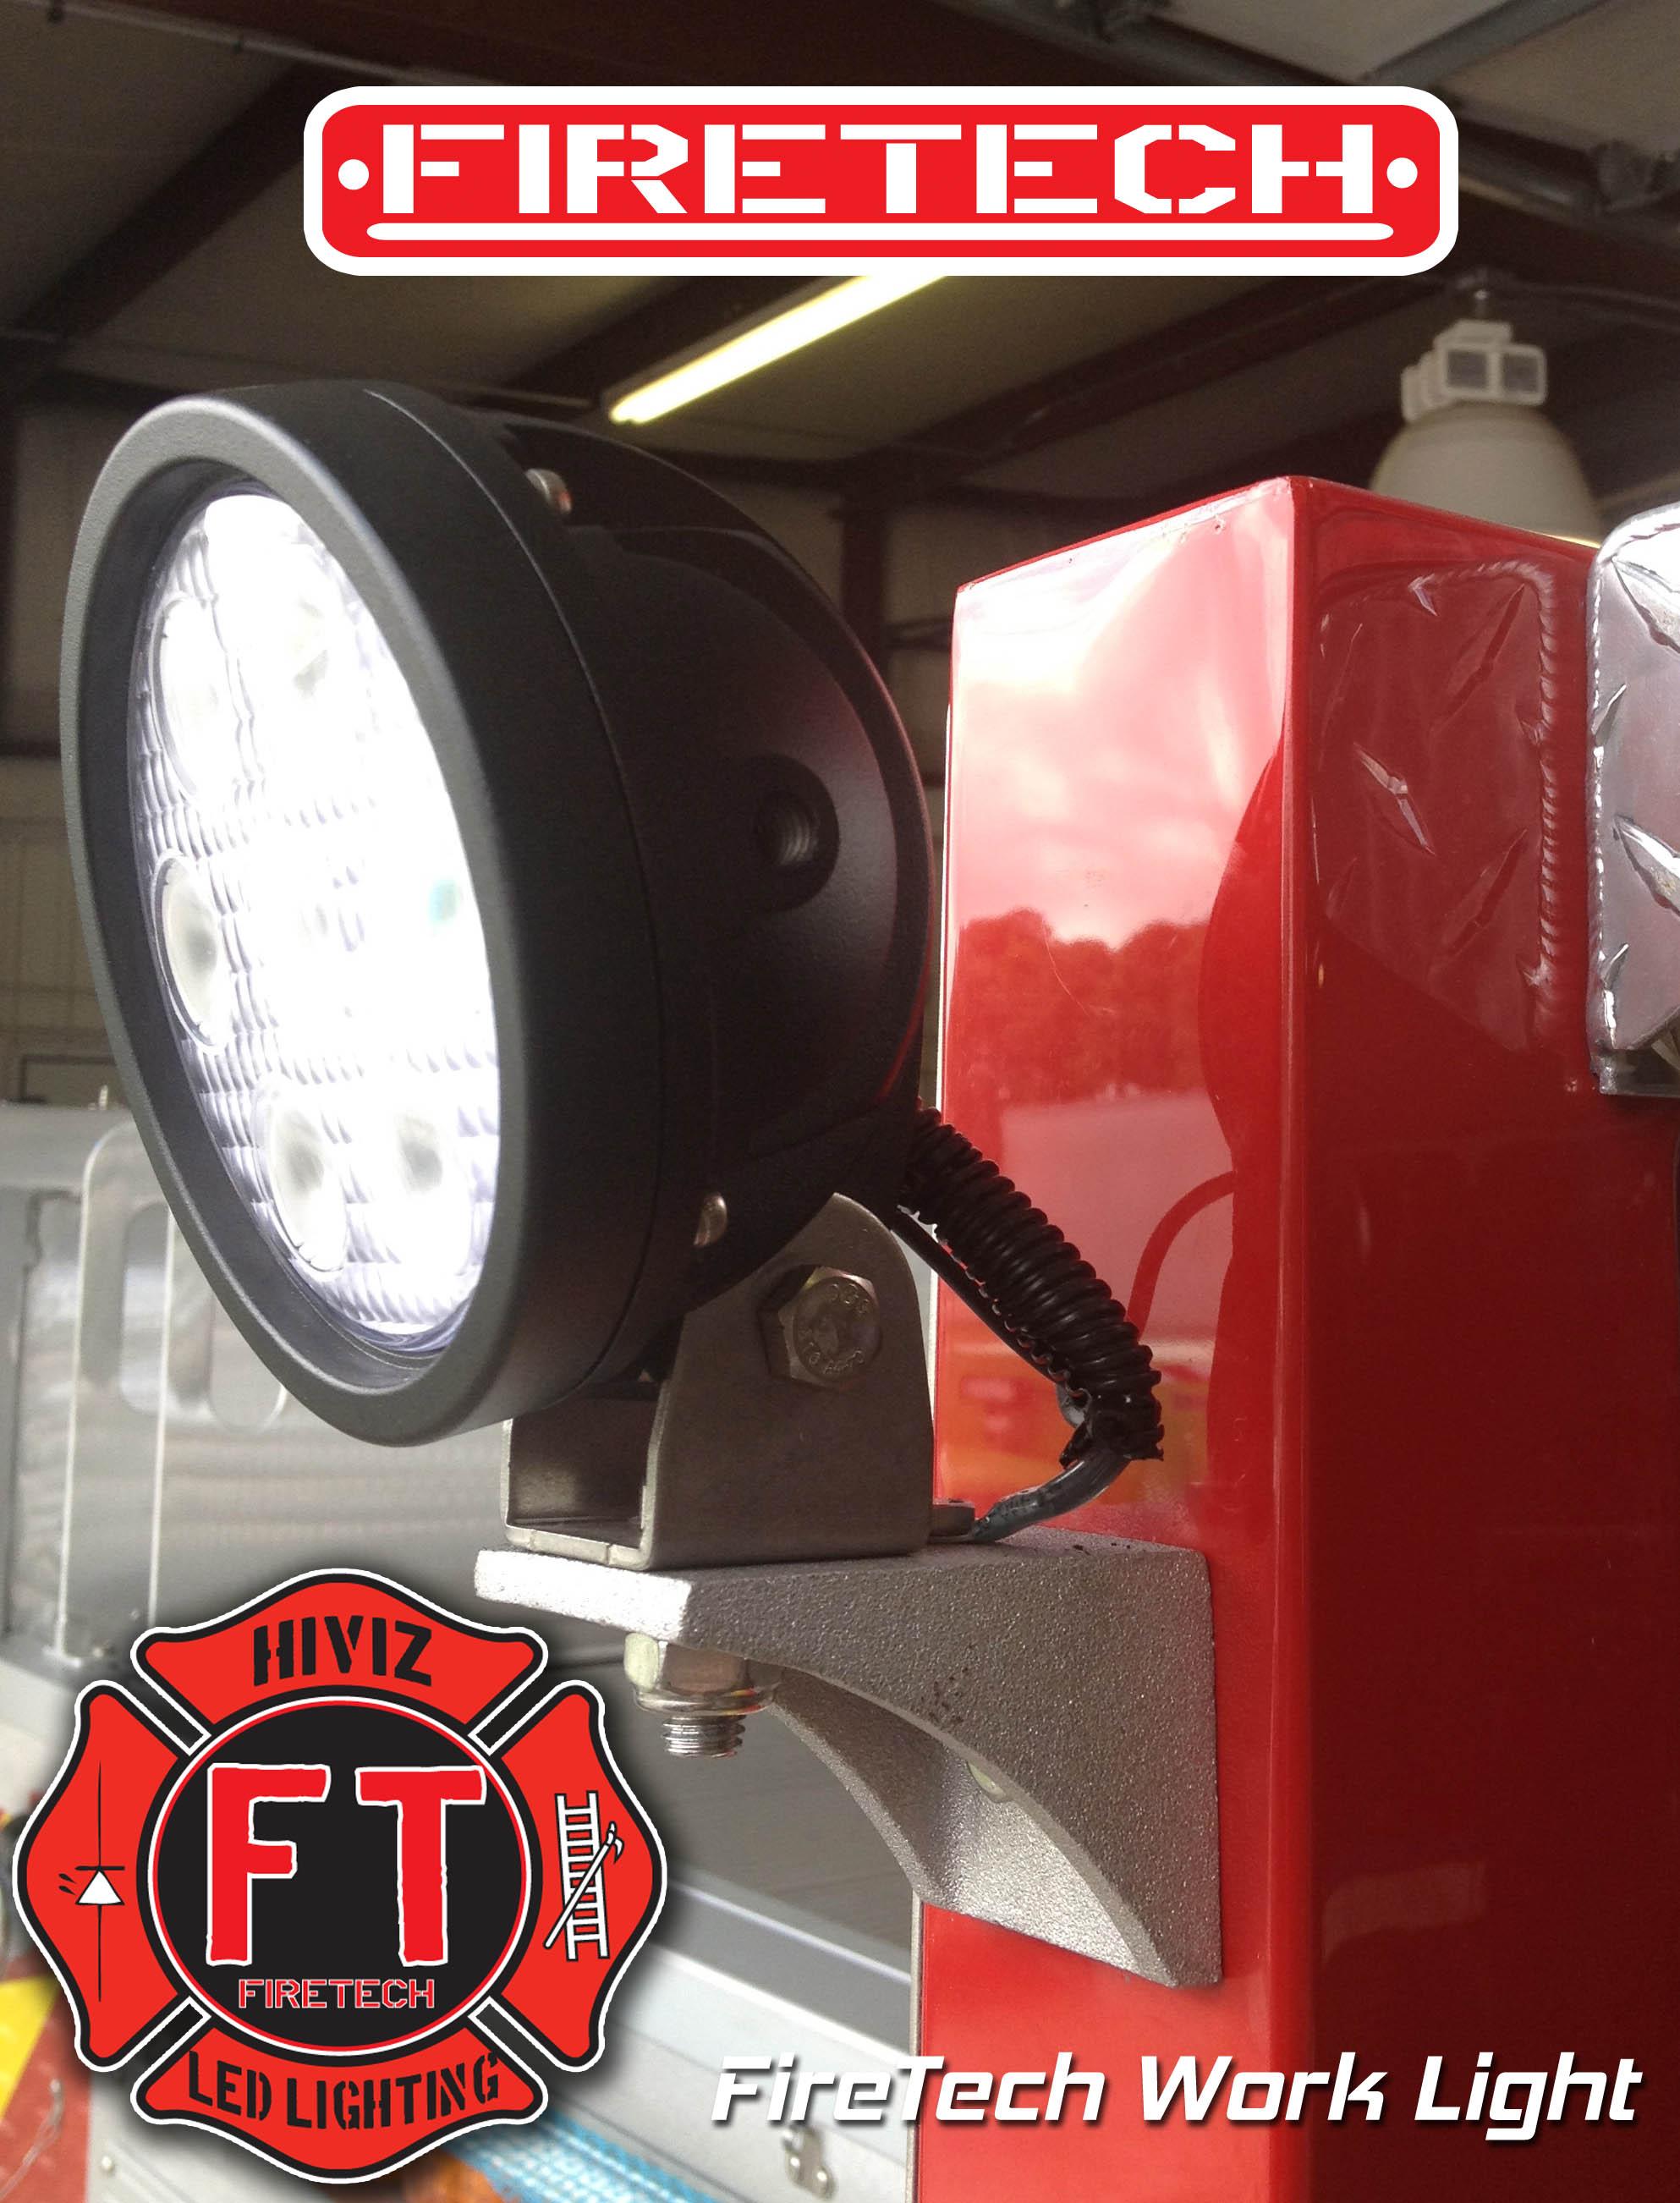 Hall Mark Fire Apparatus Joins Innovator Hiviz Led